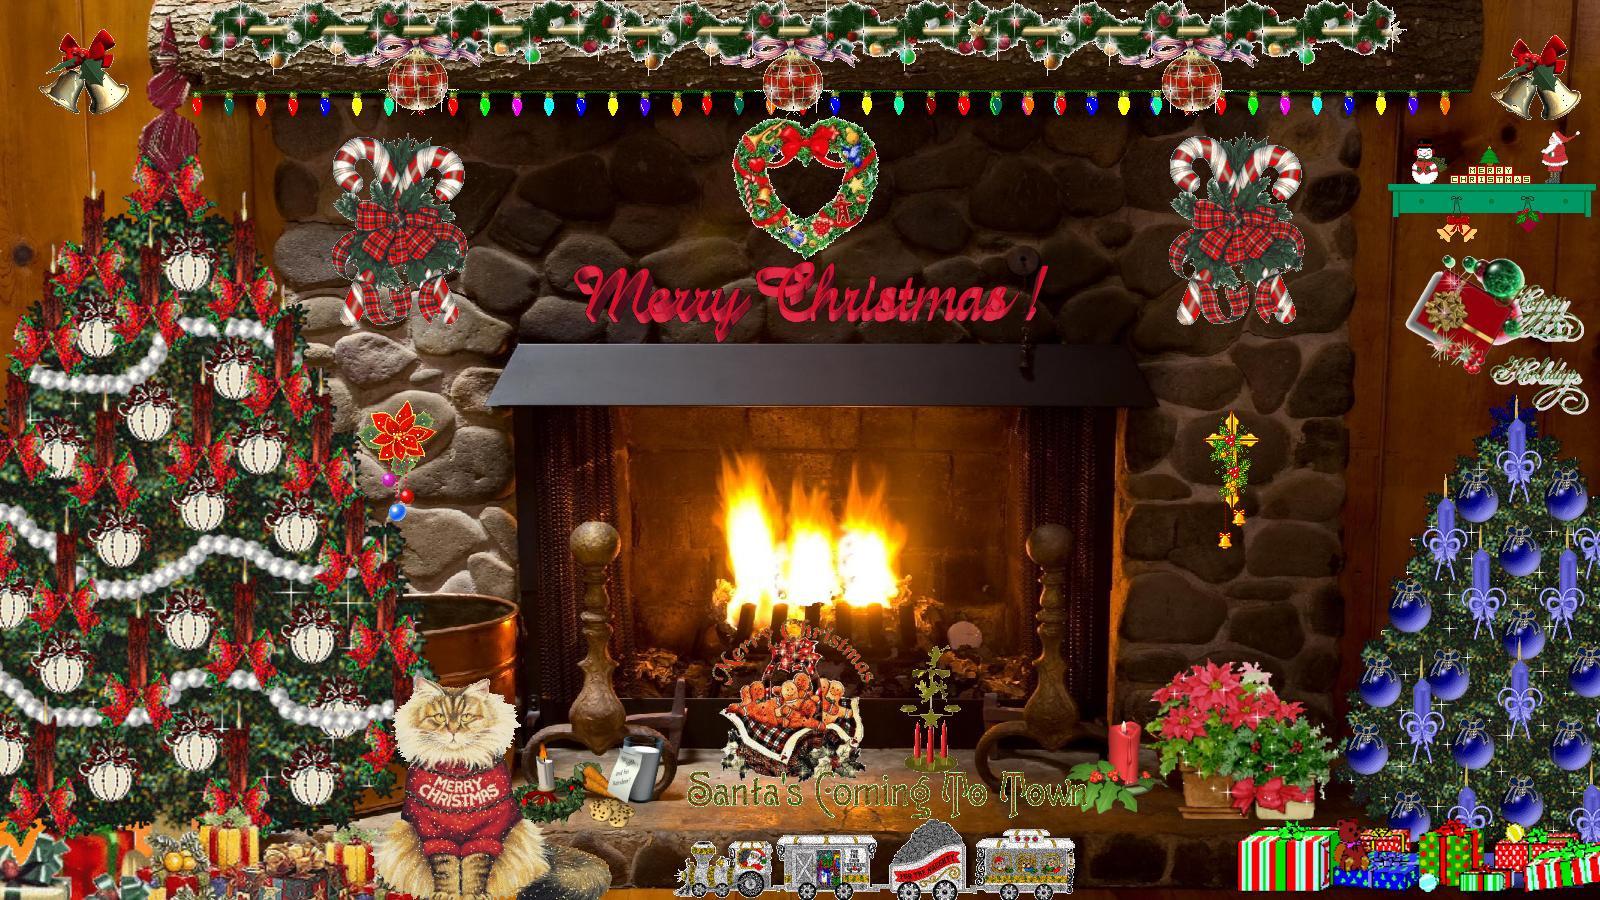 Christmas Fireplace Screensaver  Dreamscapes Animated Wallpaper WallpaperSafari